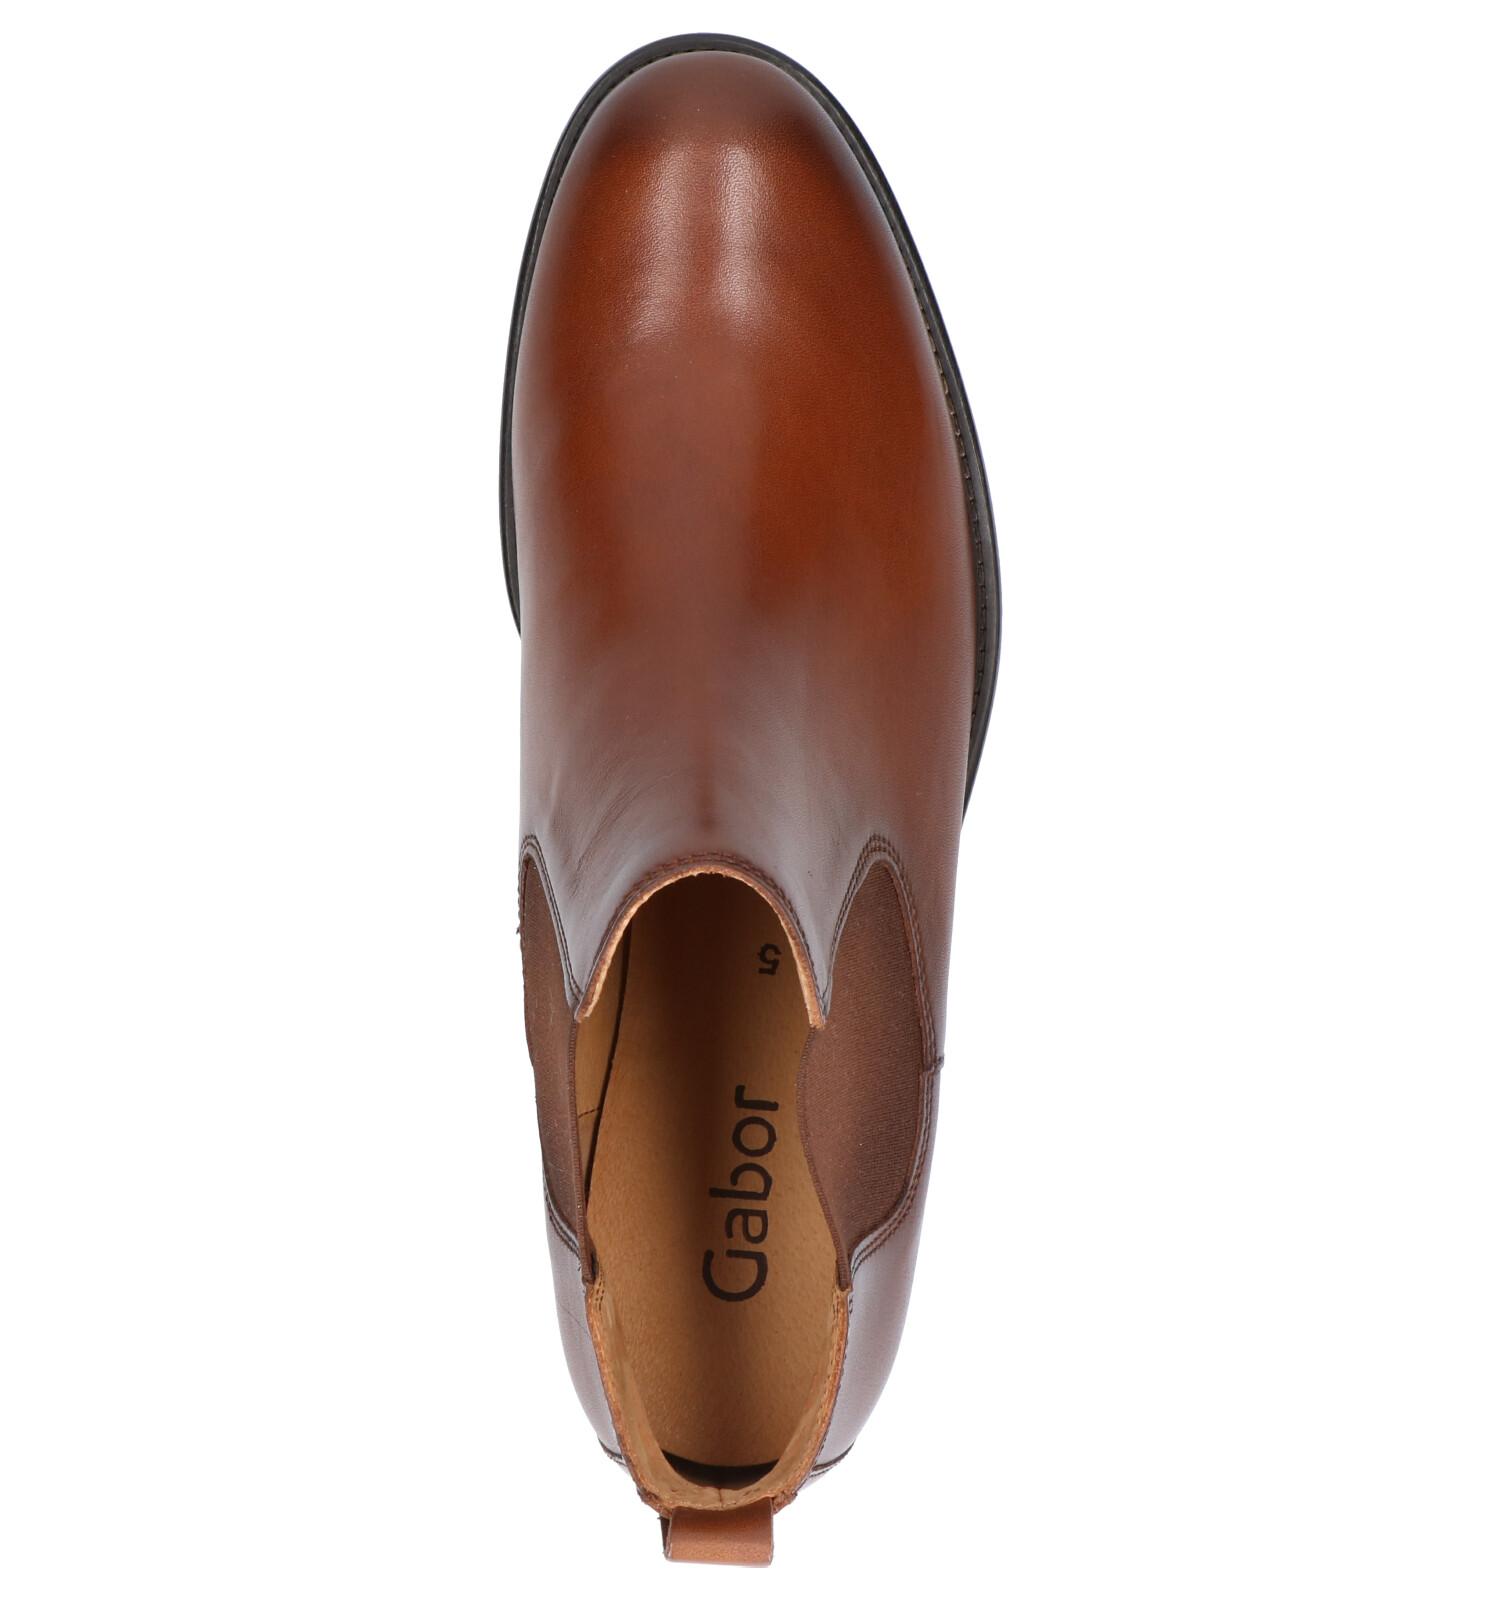 best website bcceb 426c6 Gabor Cognac Chelsea Boots   TORFS.BE   Gratis verzend en retour